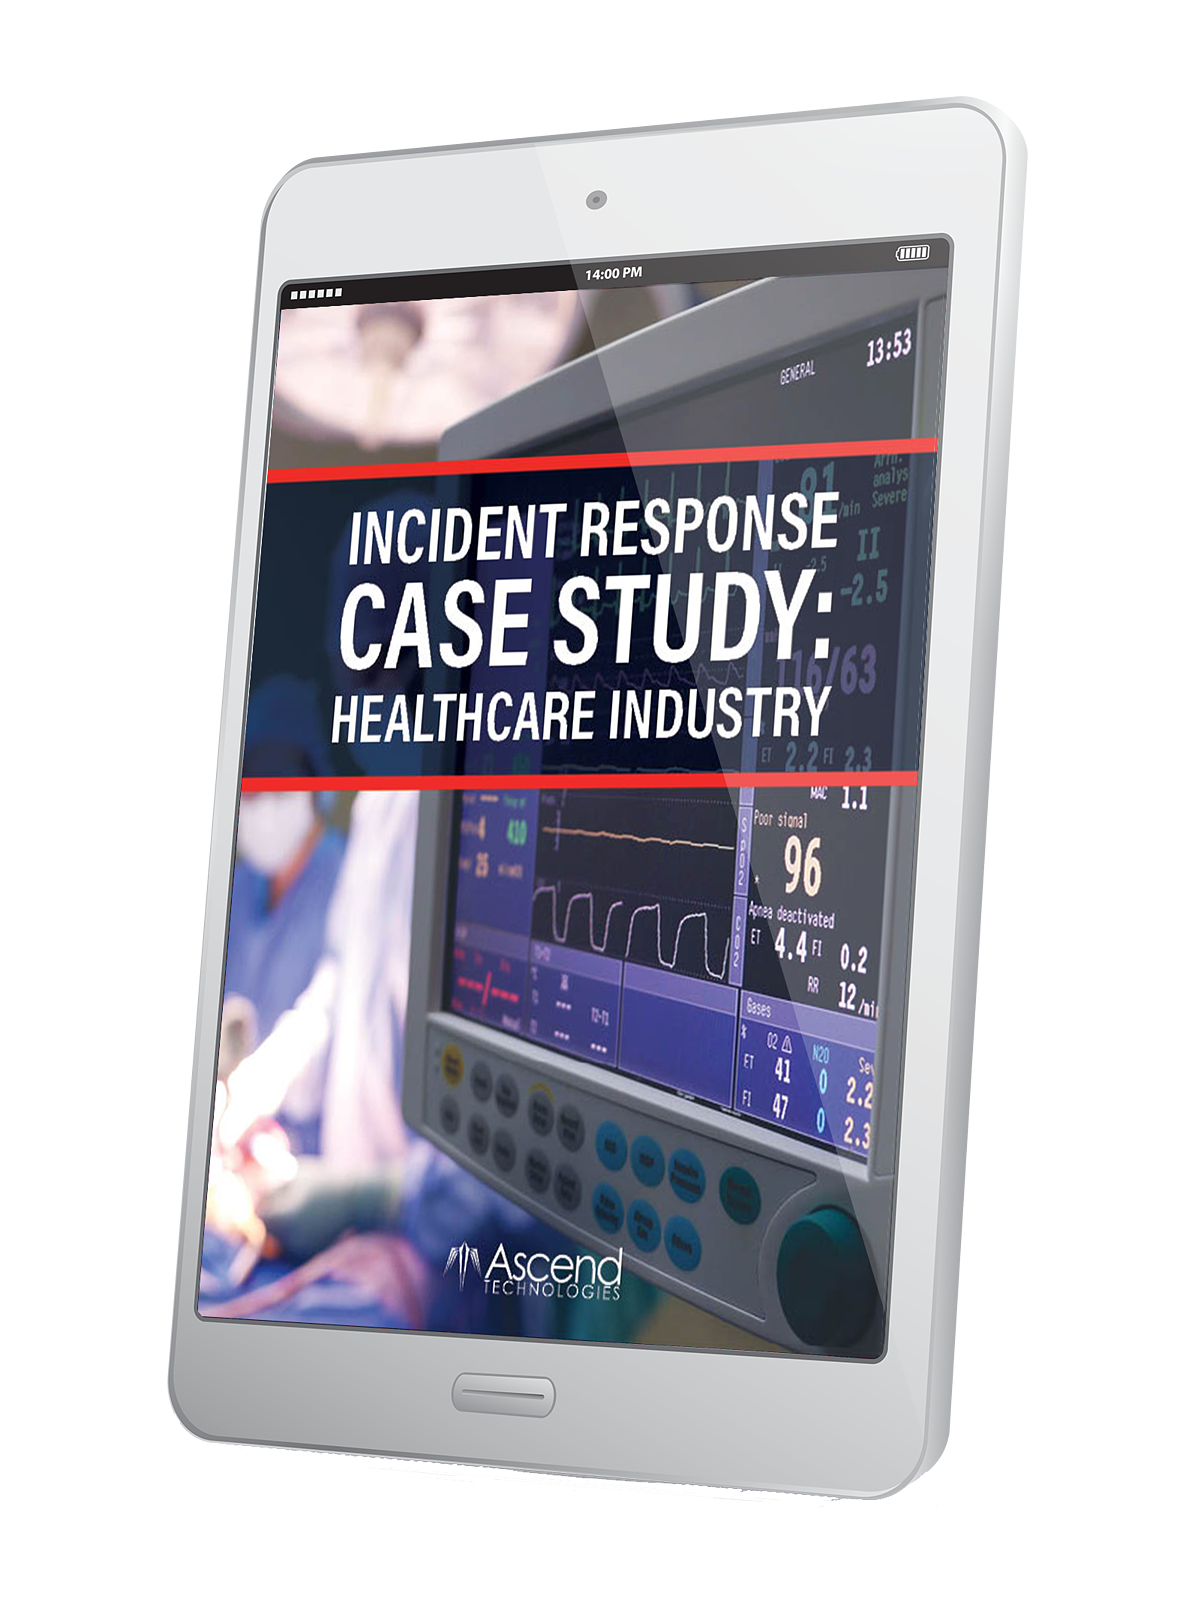 healthcare IR case study on tablet